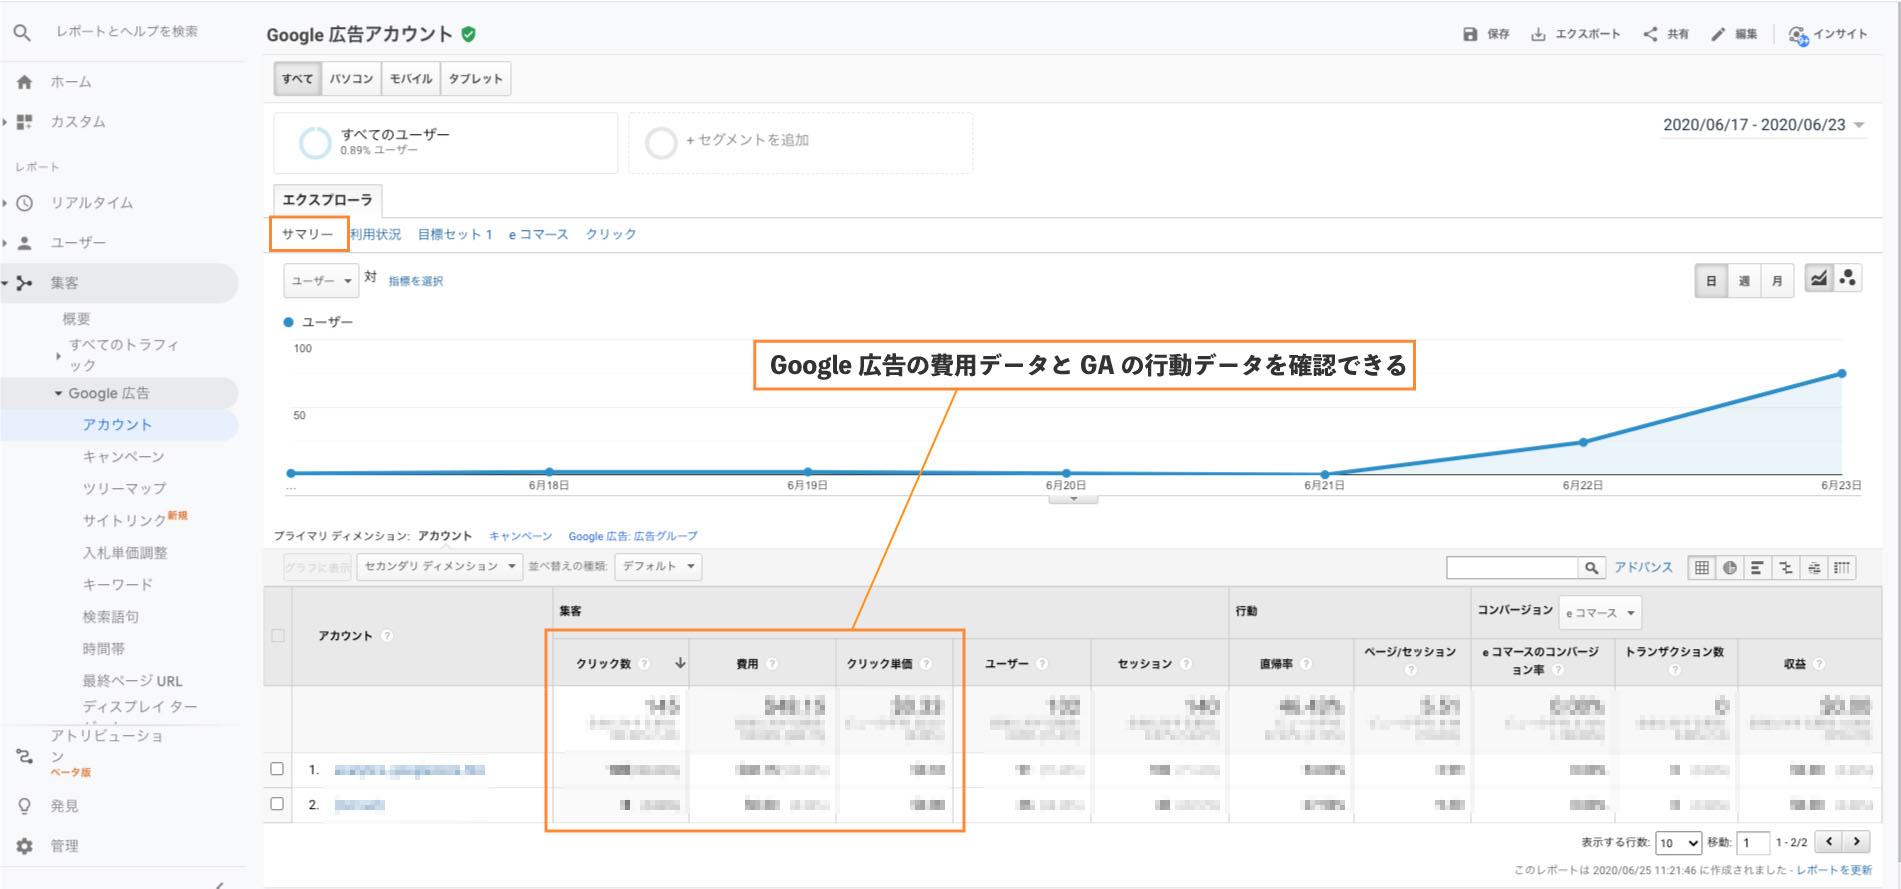 ga-googleads-report-1